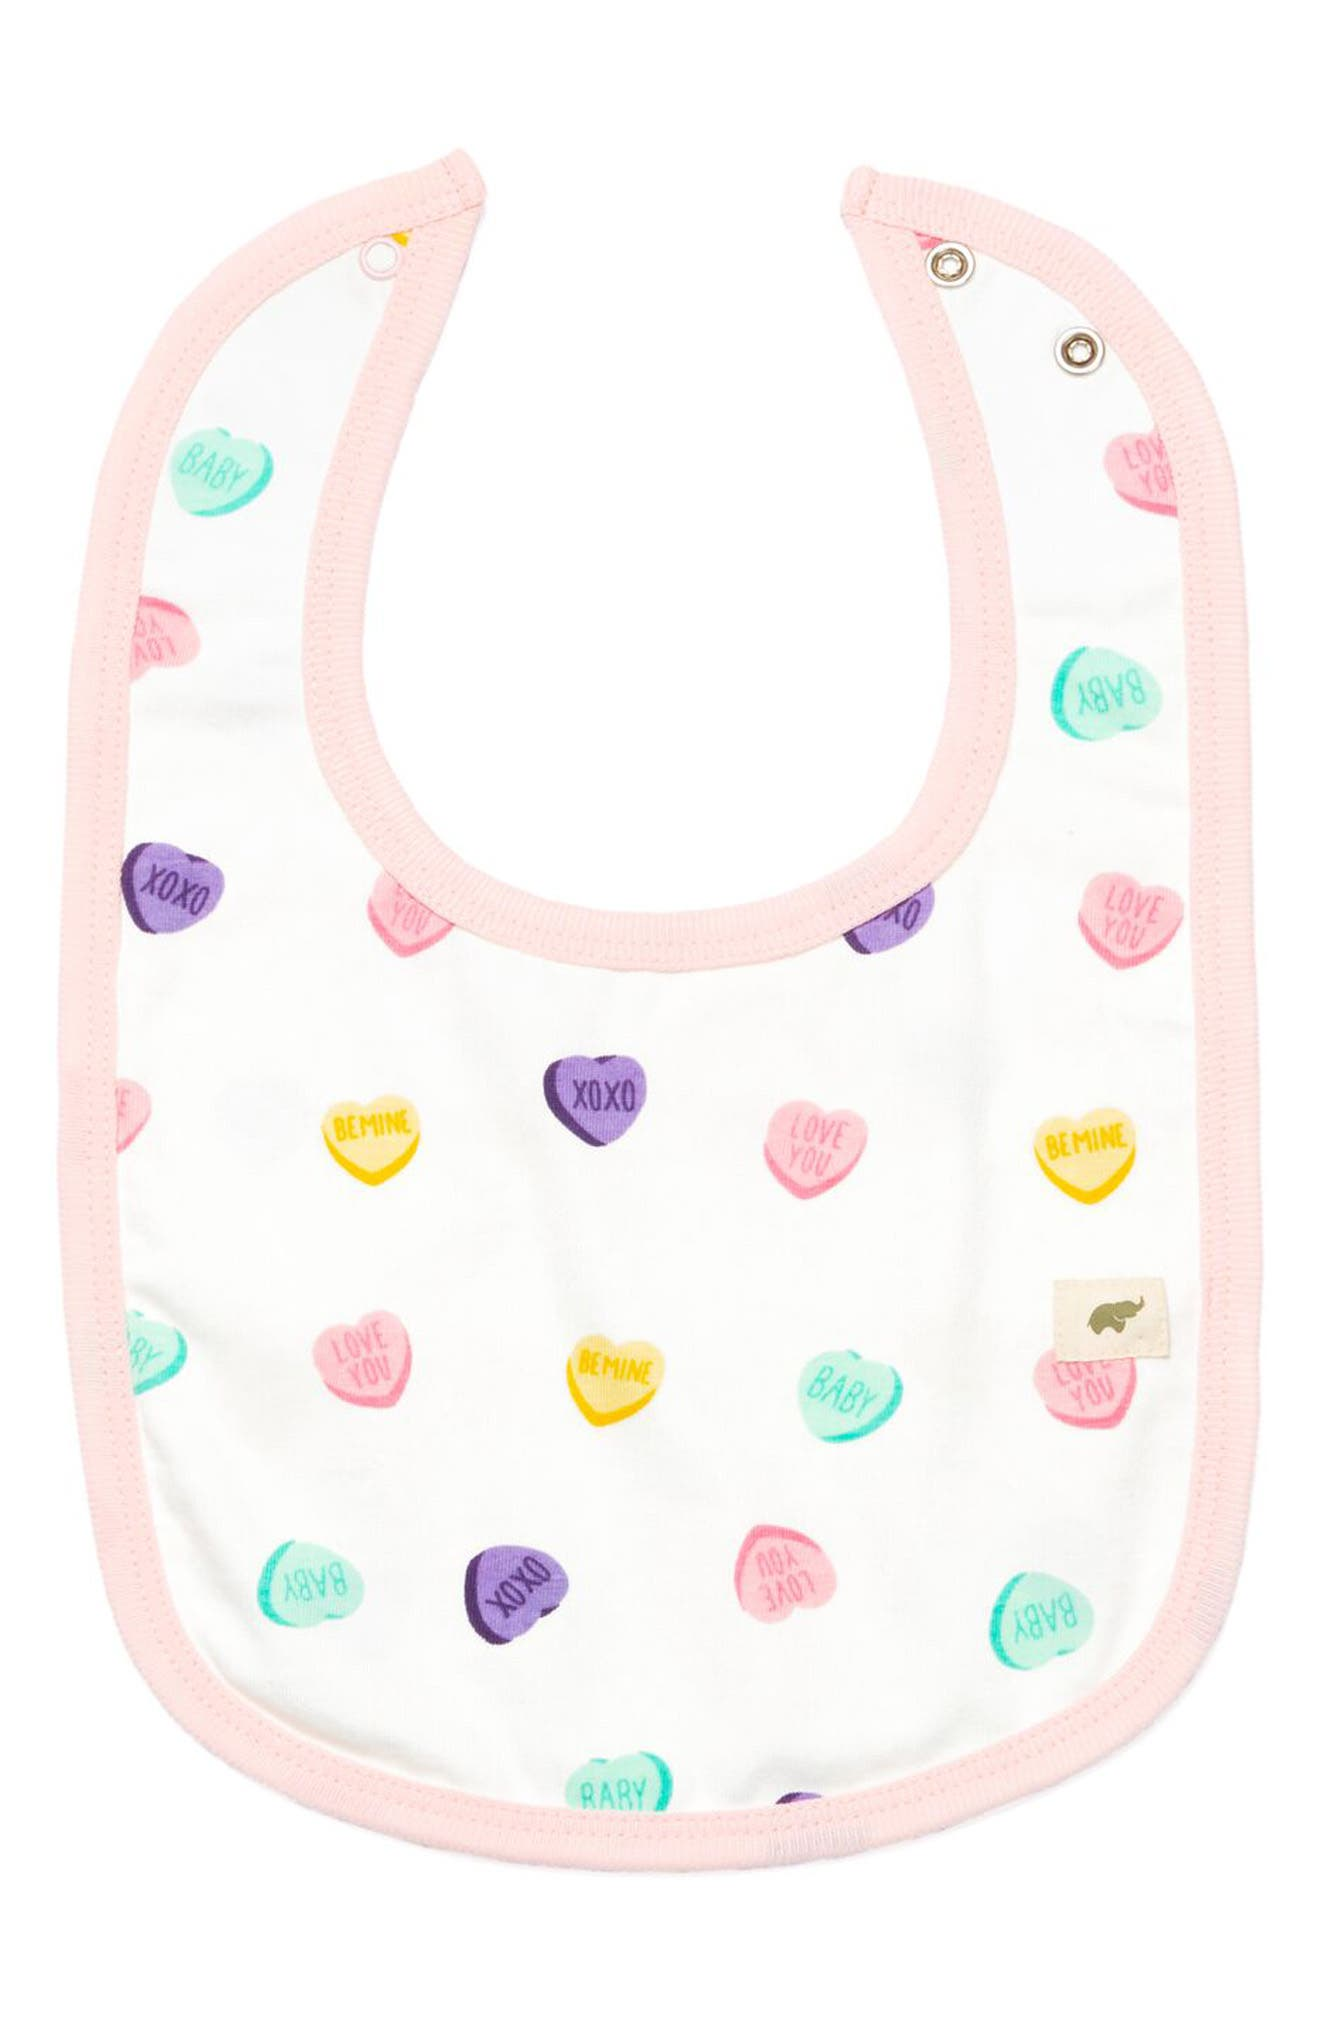 Infant Monica  Andy Conversation Heart Print Organic Stretch Cotton Bib Size One Size  Pink